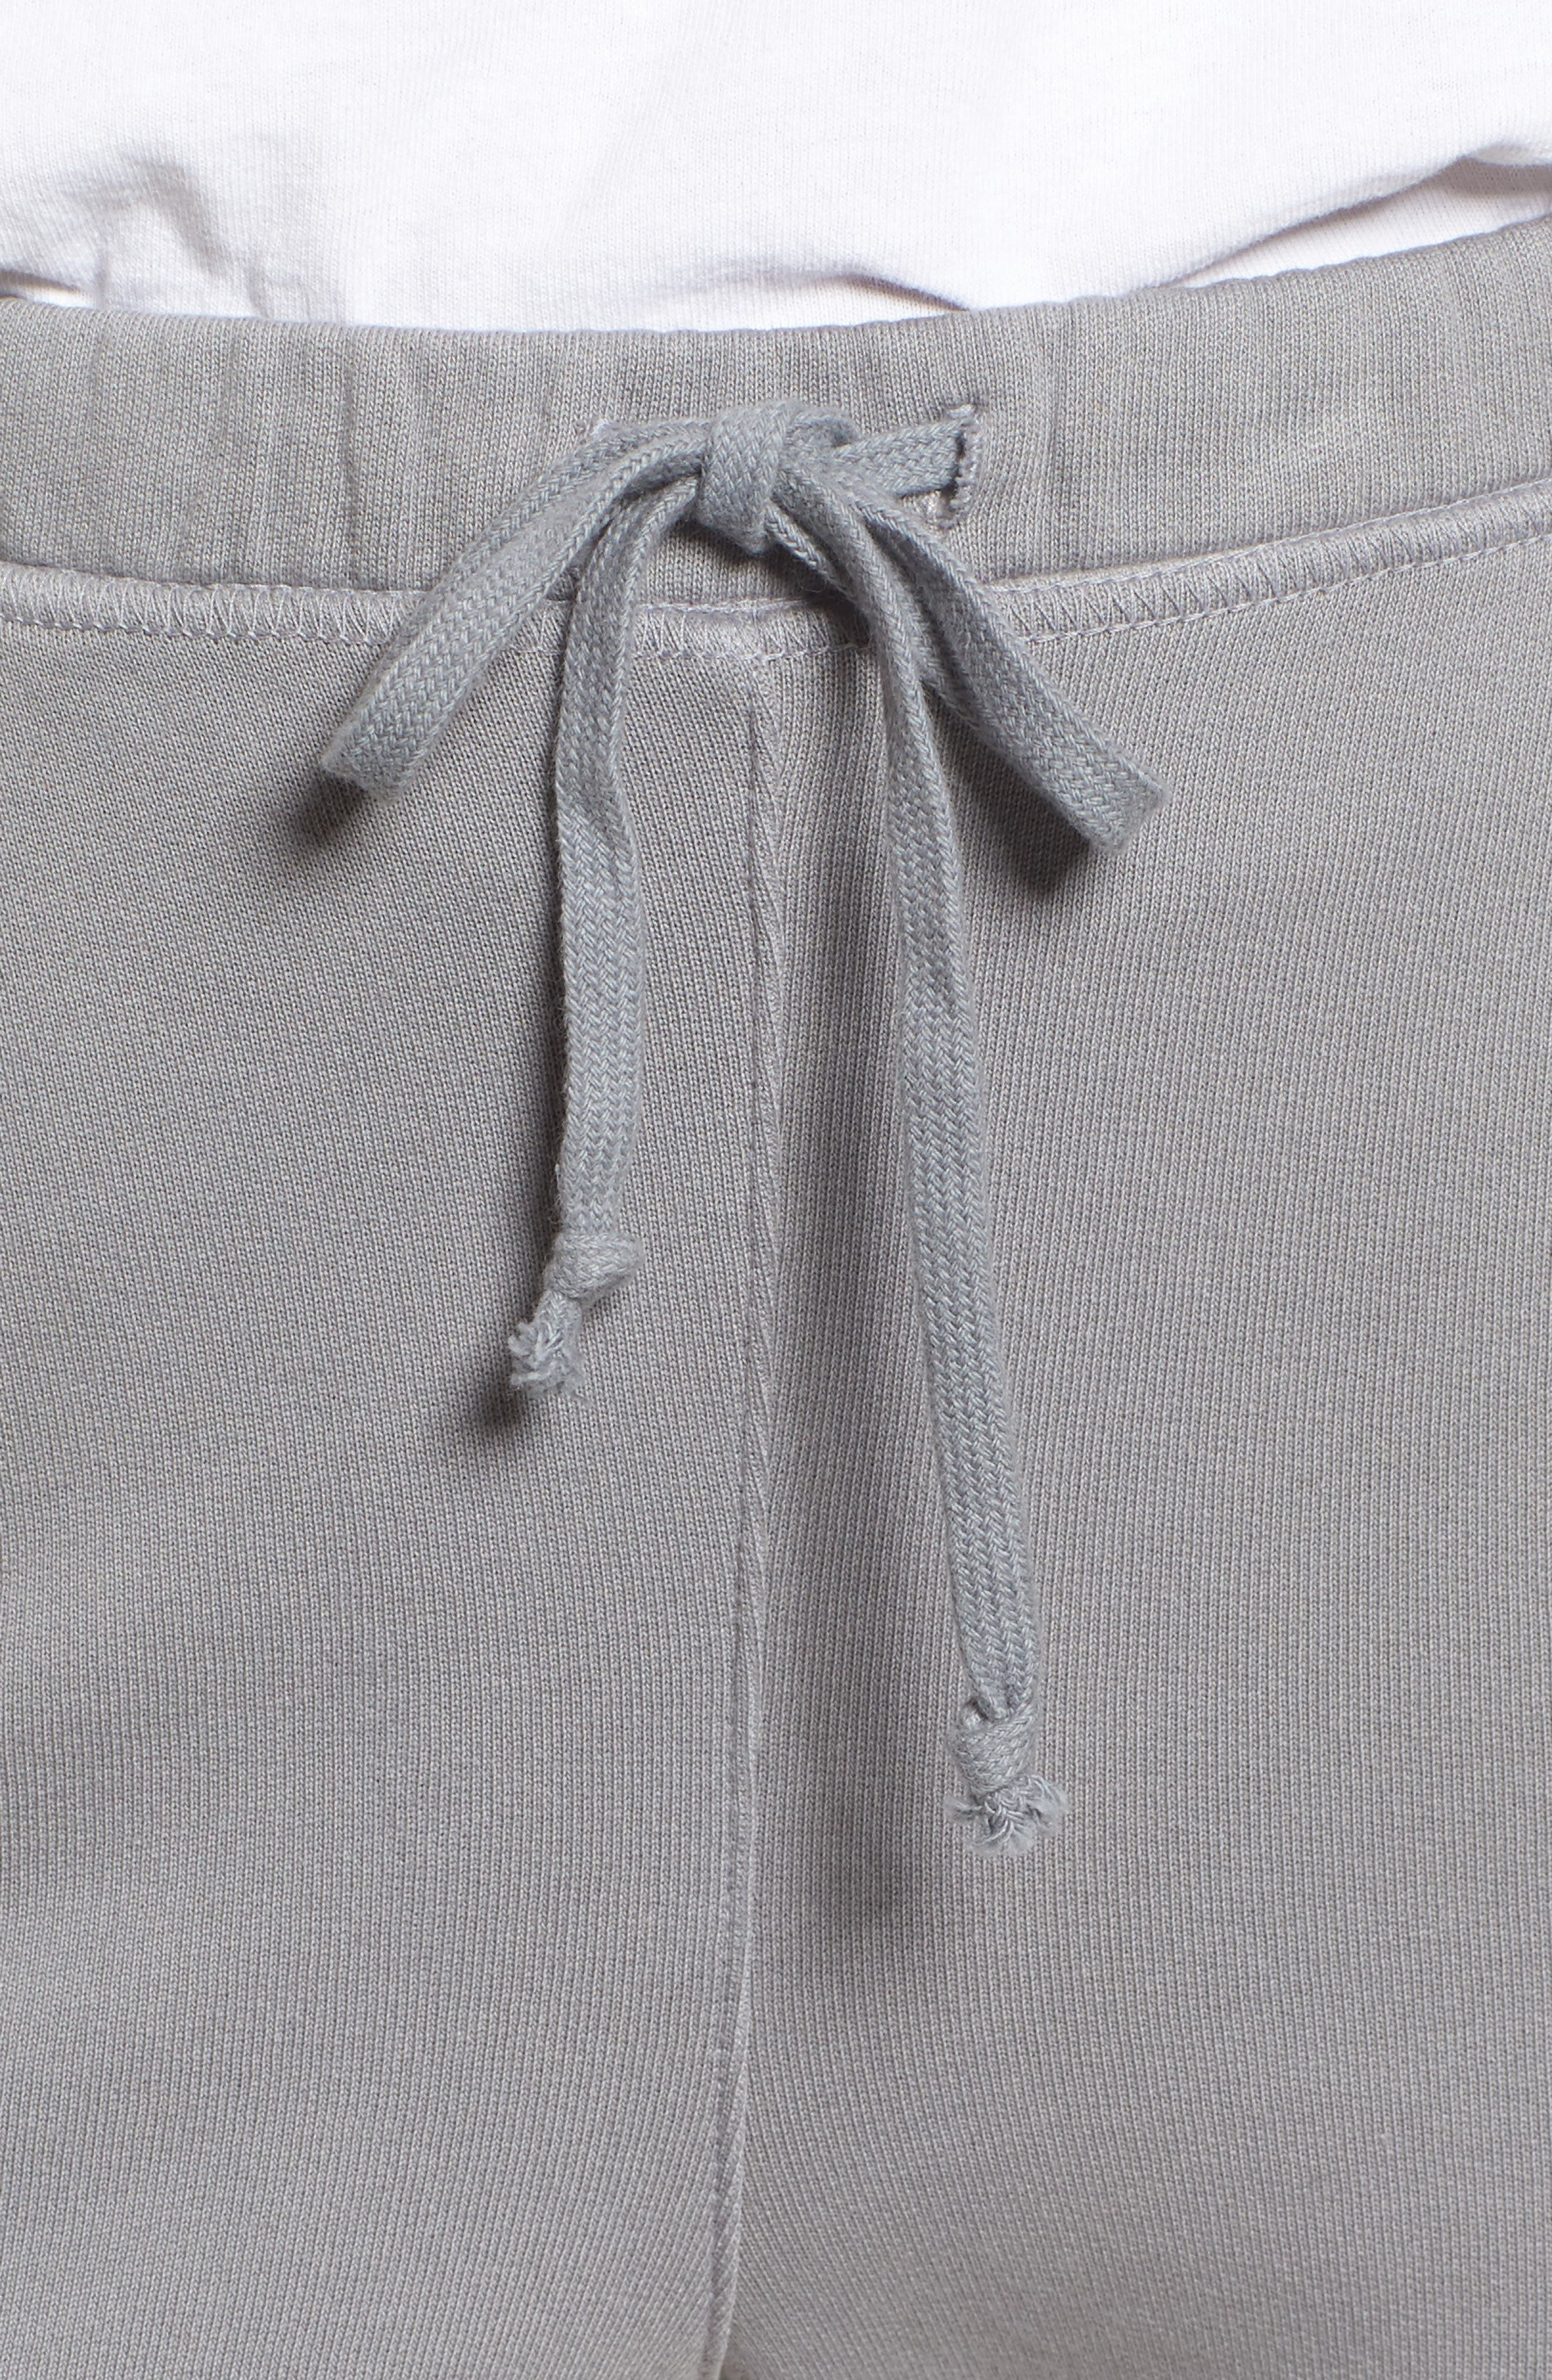 Tee Lab Raw Hem Crop Sweatpants,                             Alternate thumbnail 4, color,                             Shadow